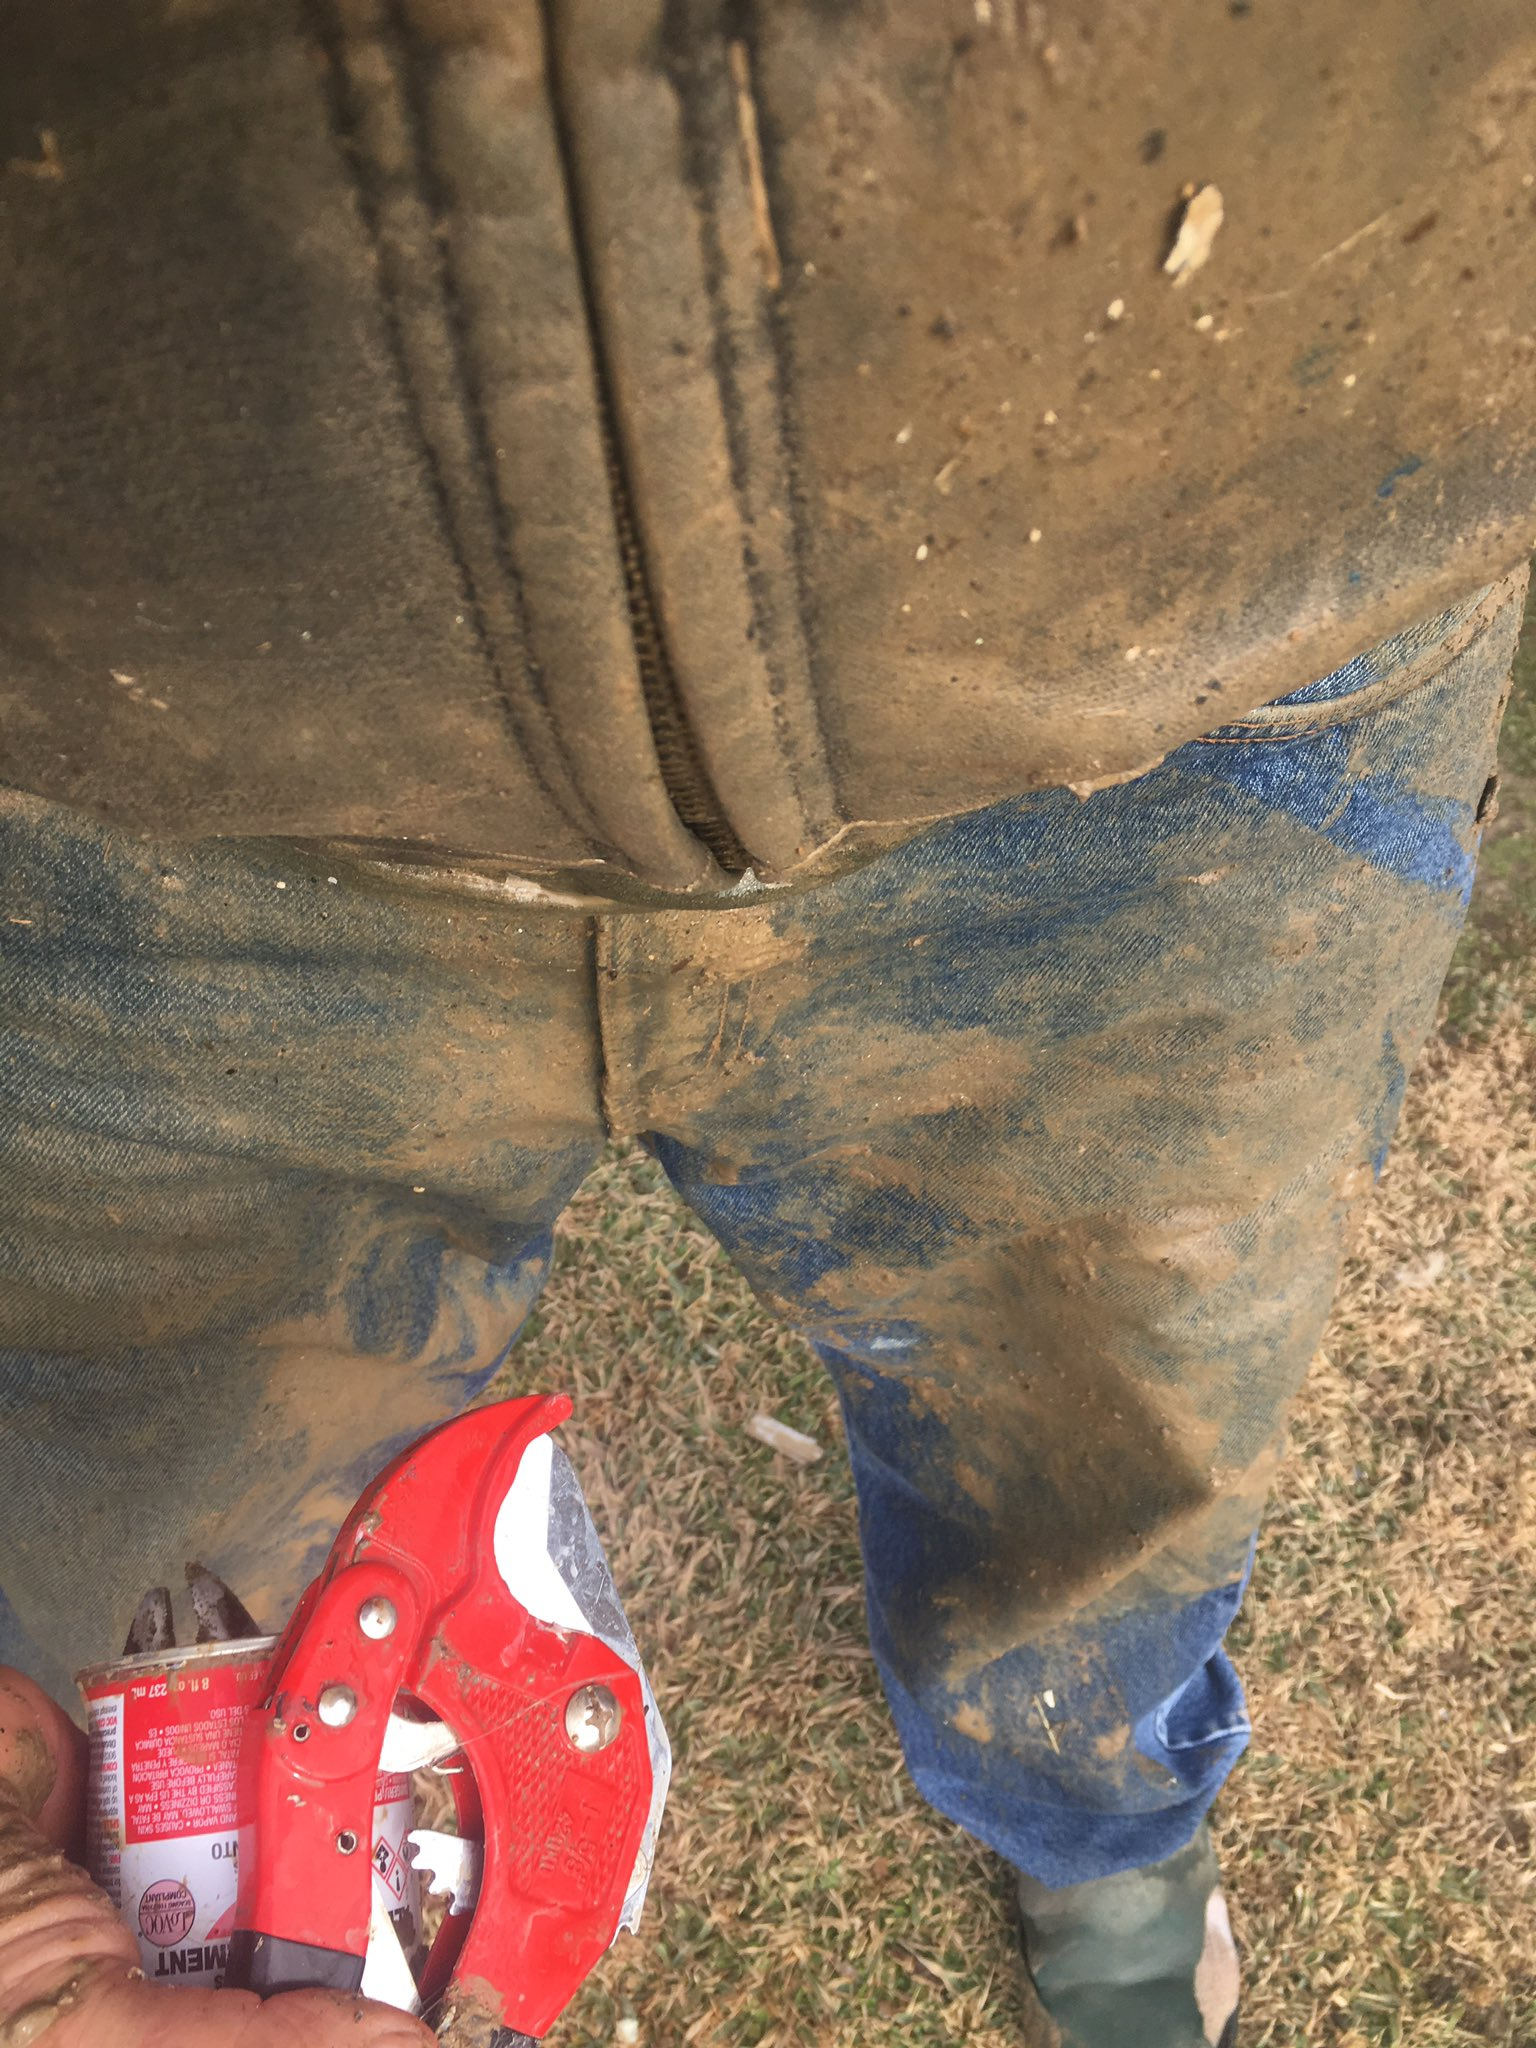 @mbabs21 I sure did .. I also got super muddy wet too . Lol https://t.co/E7pi1OvaPI